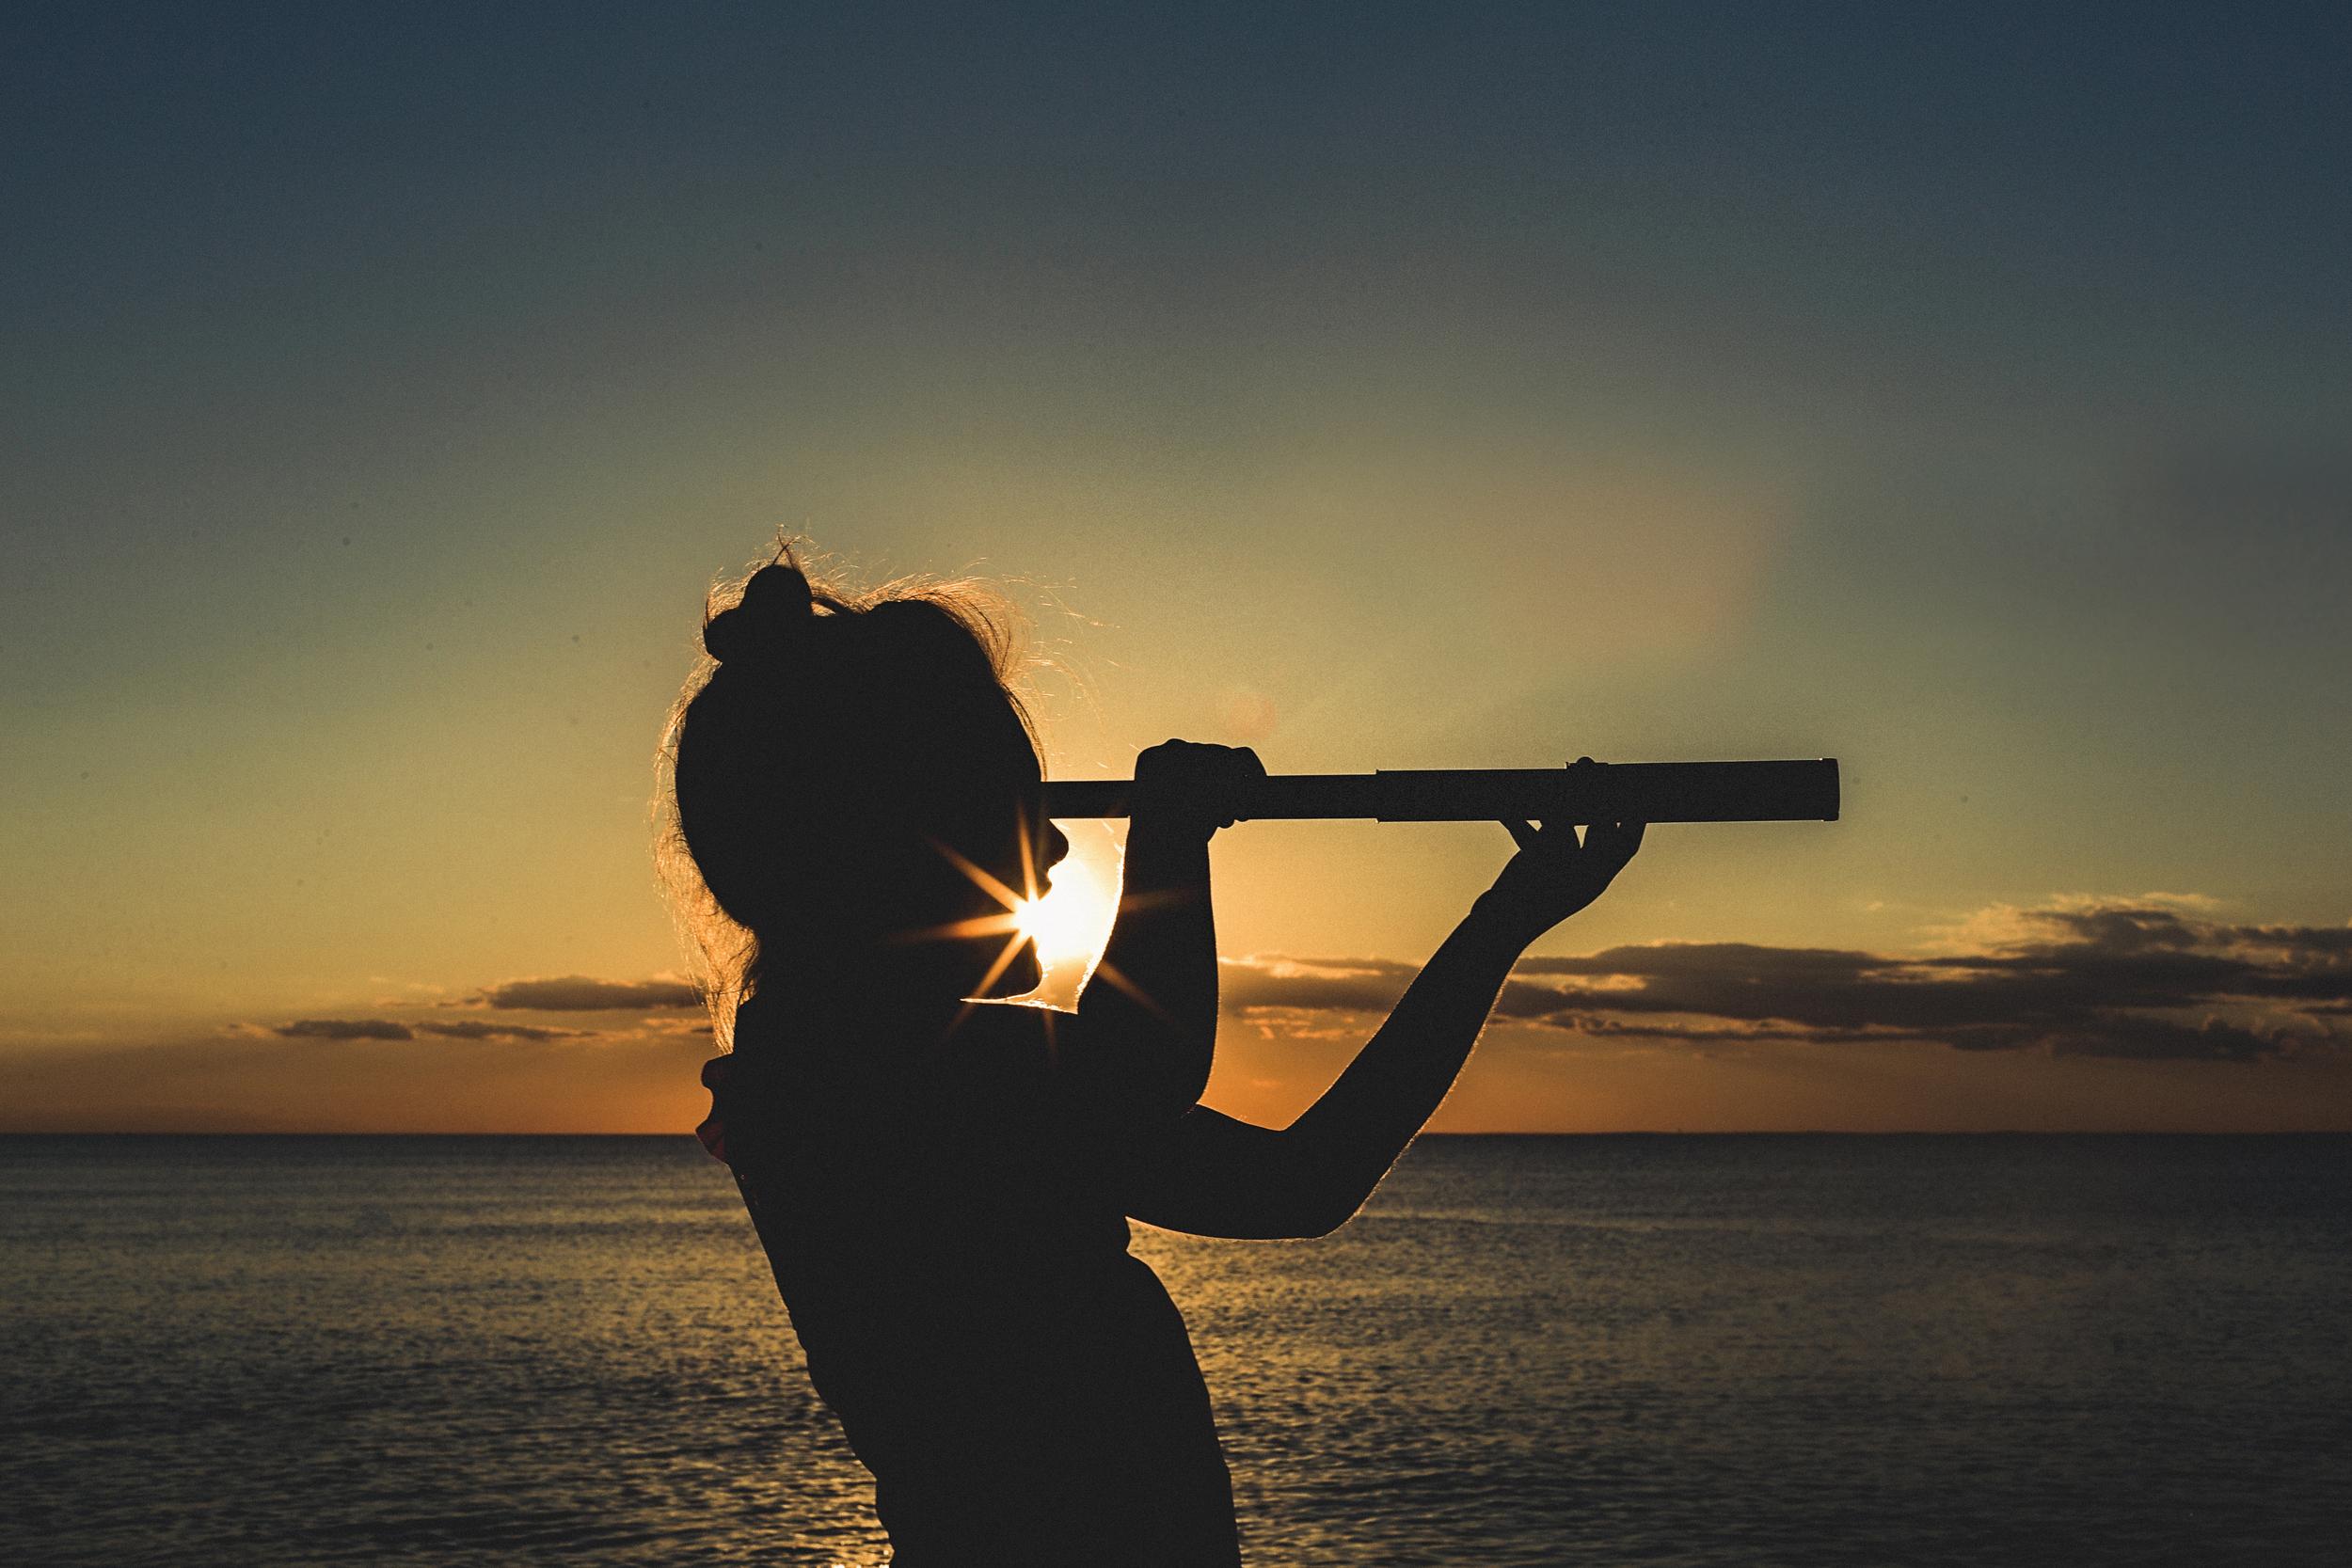 Hello-olivia-photography-long-island-photographer-family-kids-freelensing-beach-spyglass-silhouette